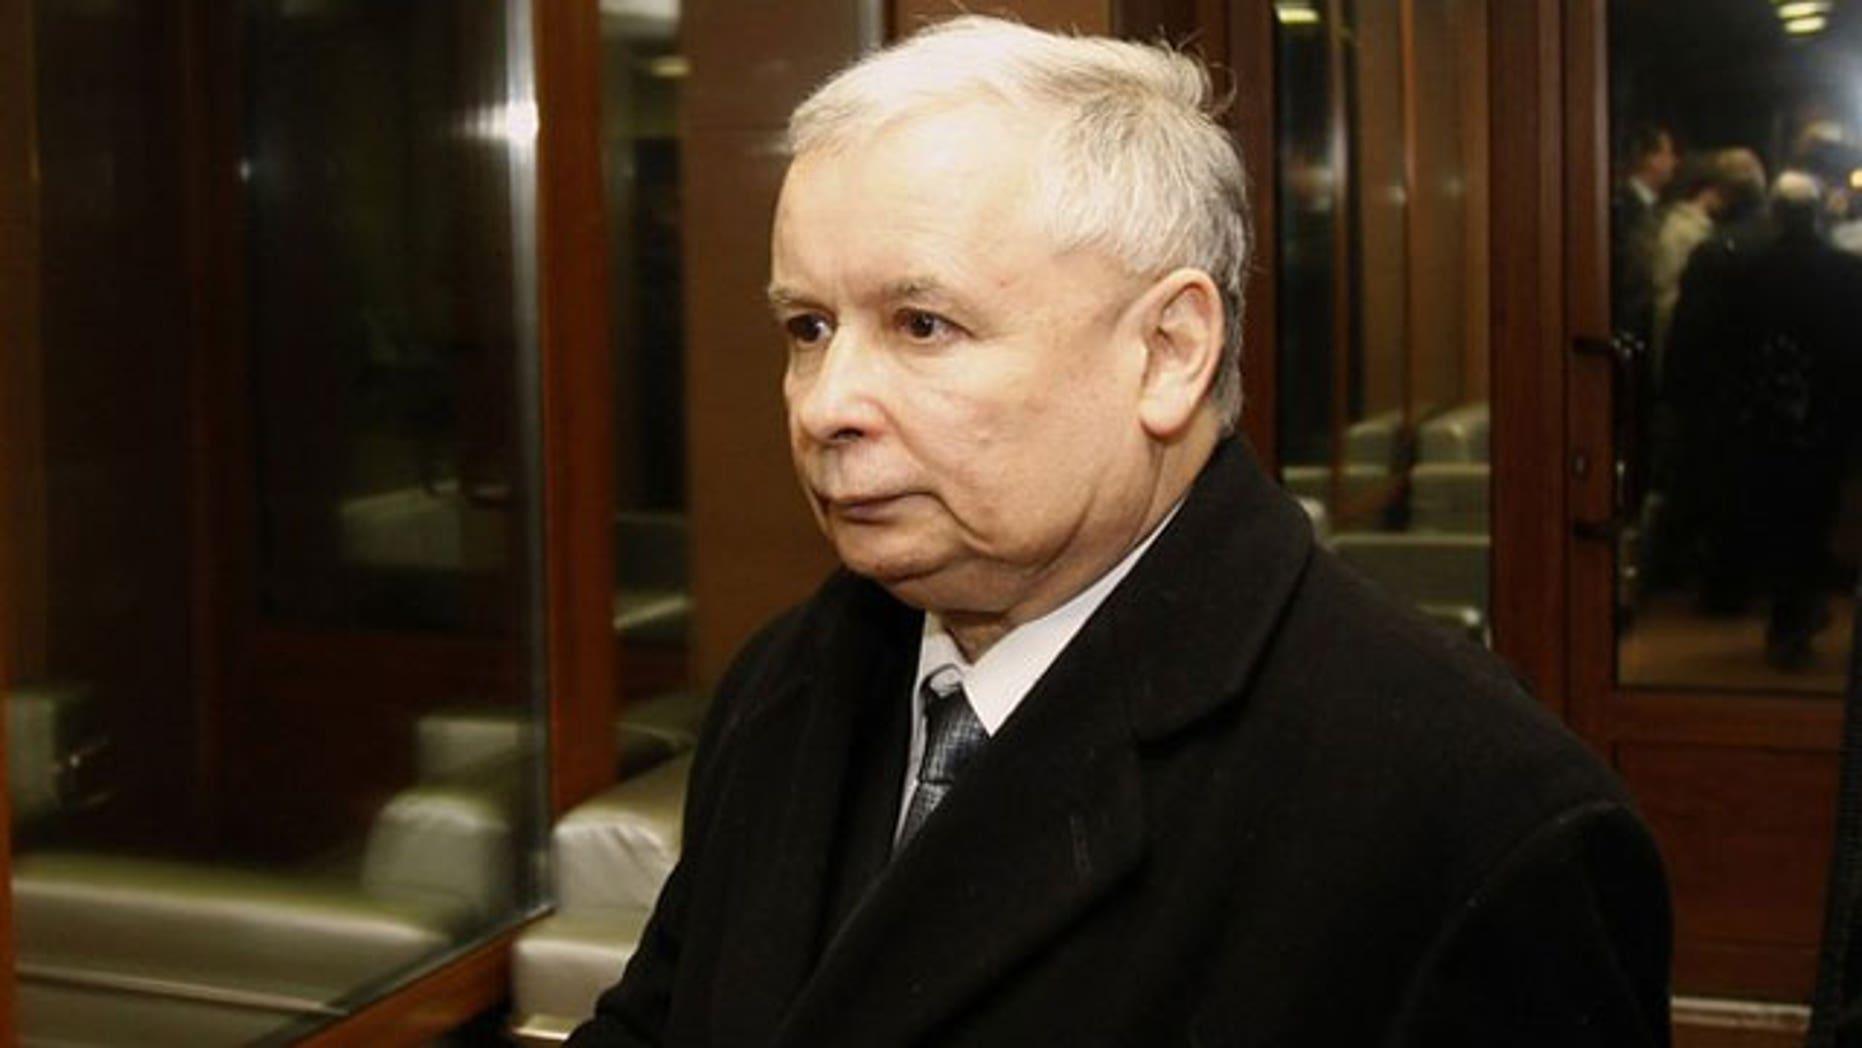 Jaroslaw Kaczynski, twin brother of Polish President Lech Kaczynski, is seen at Smolensk airport April 10, 2010 (Reuters).